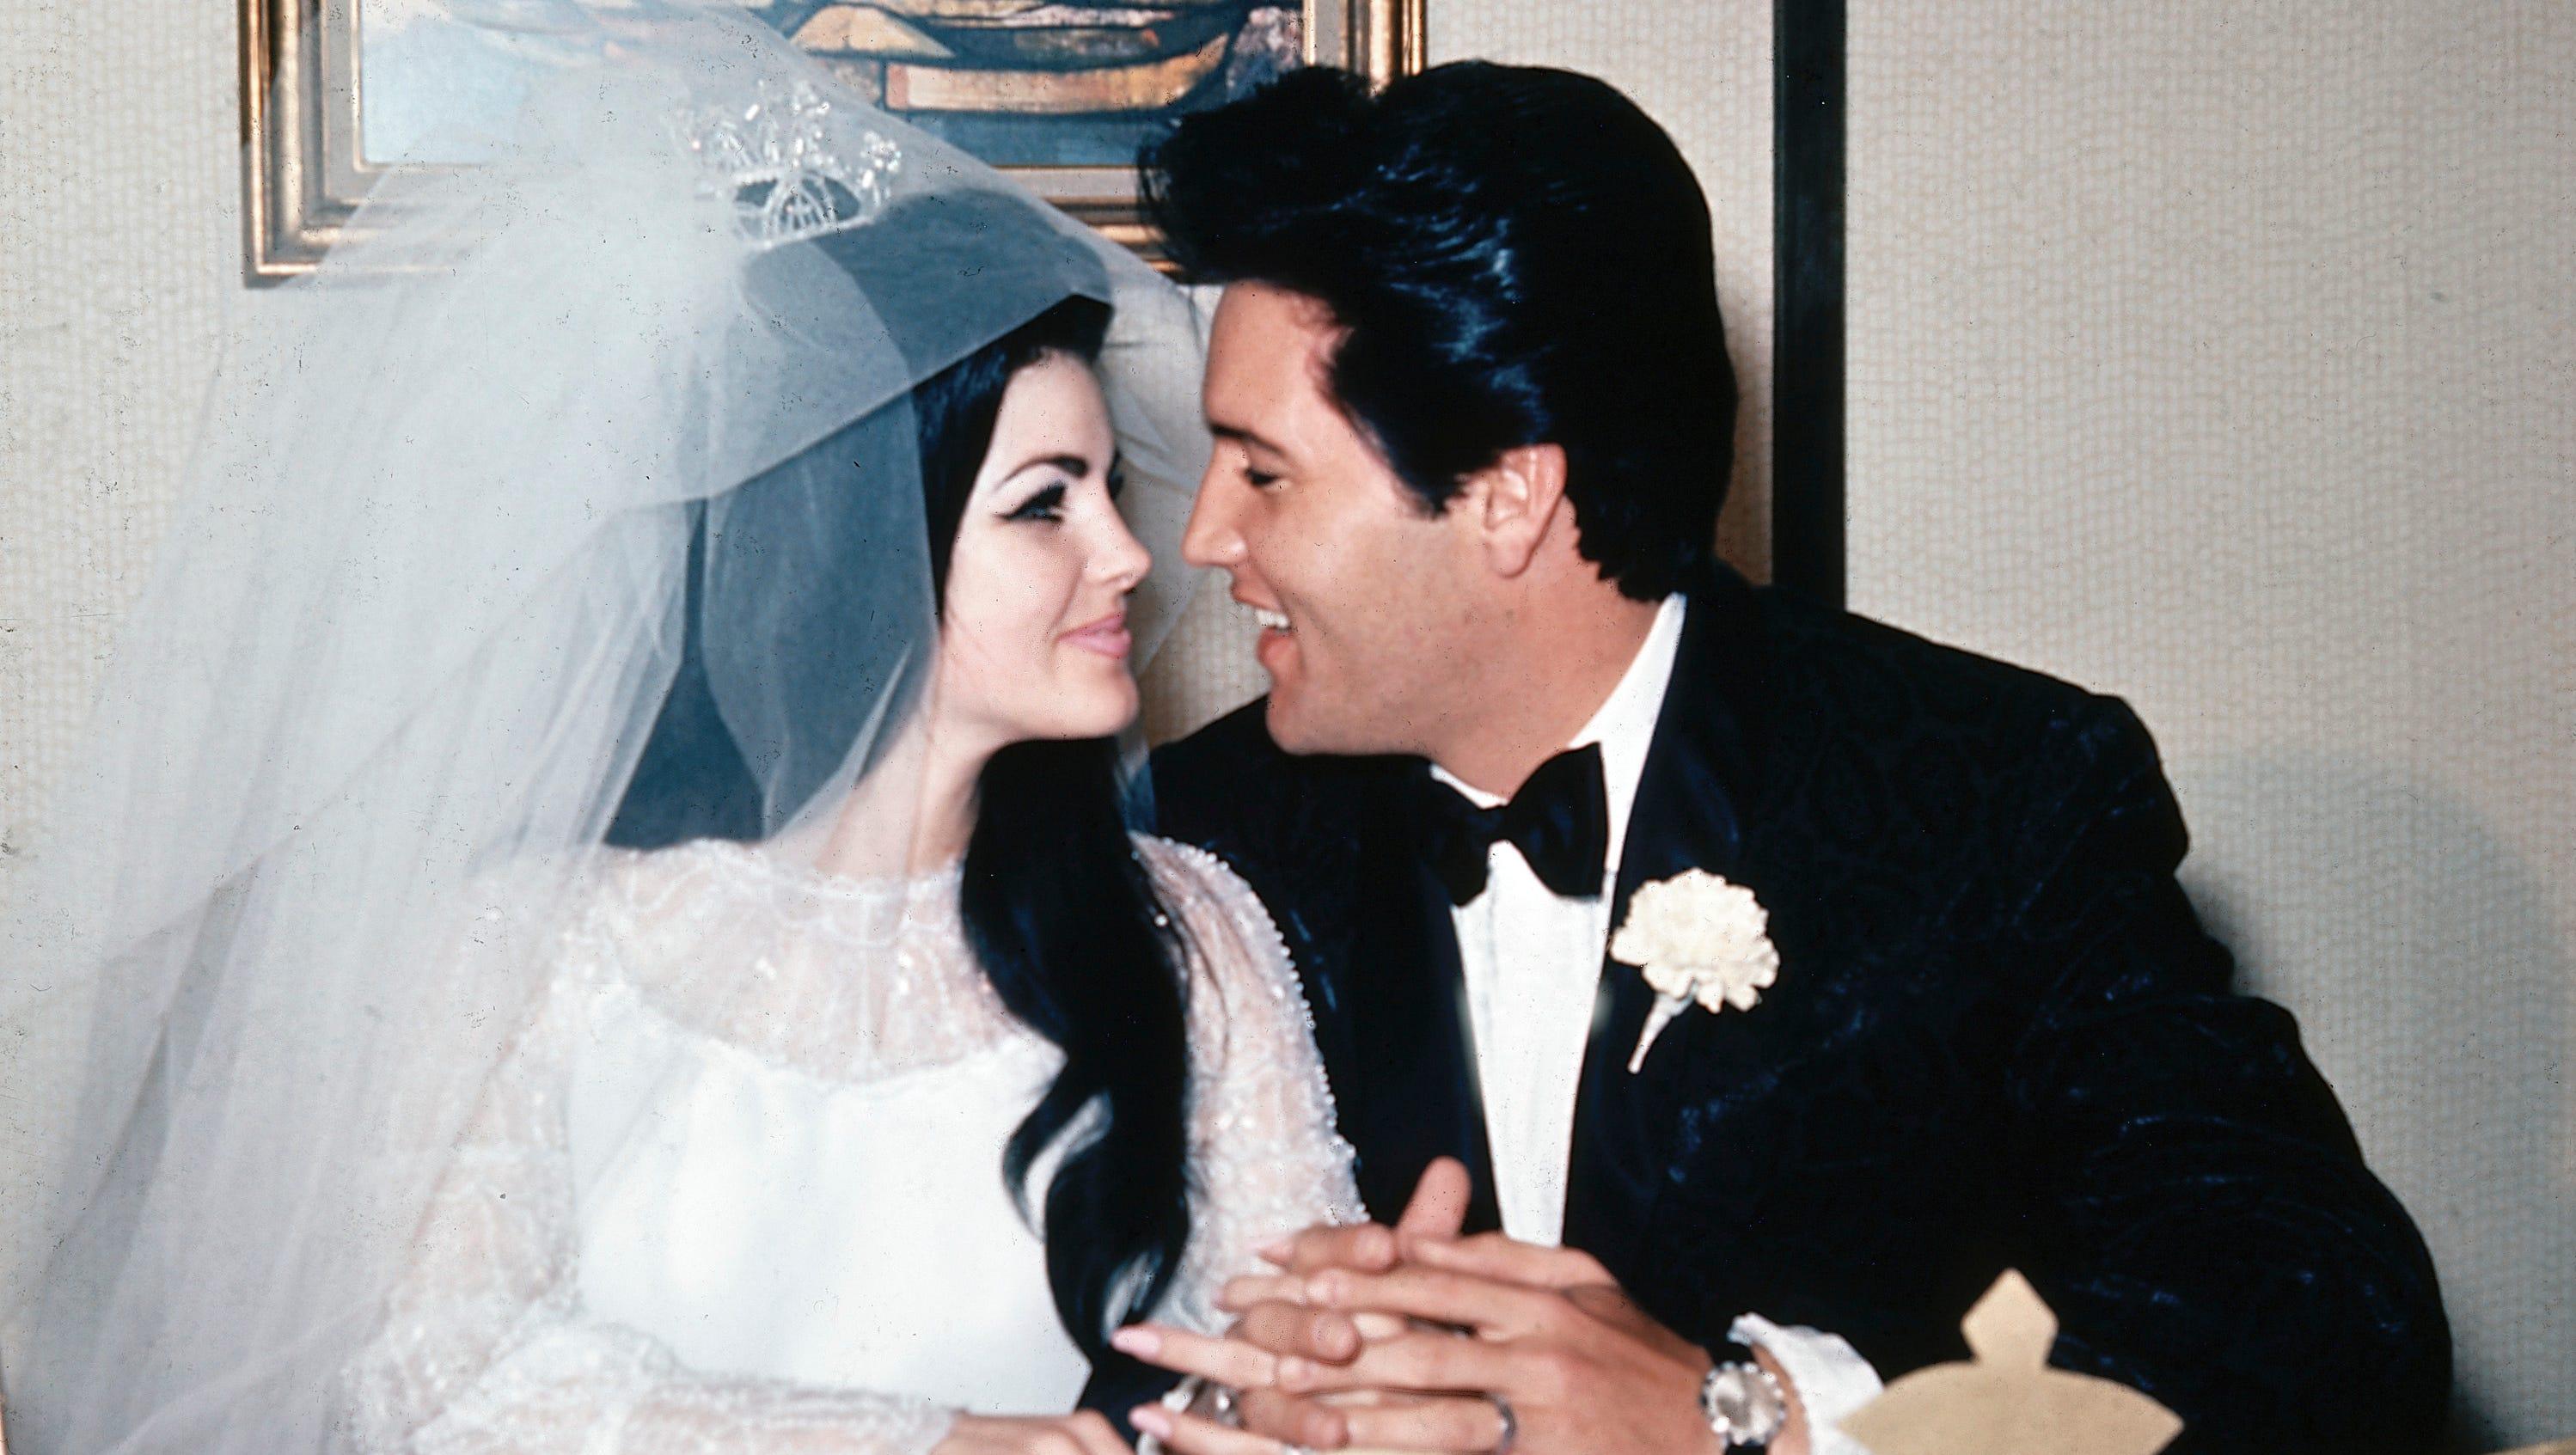 Priscilla Presley Reveals Why She Left Elvis